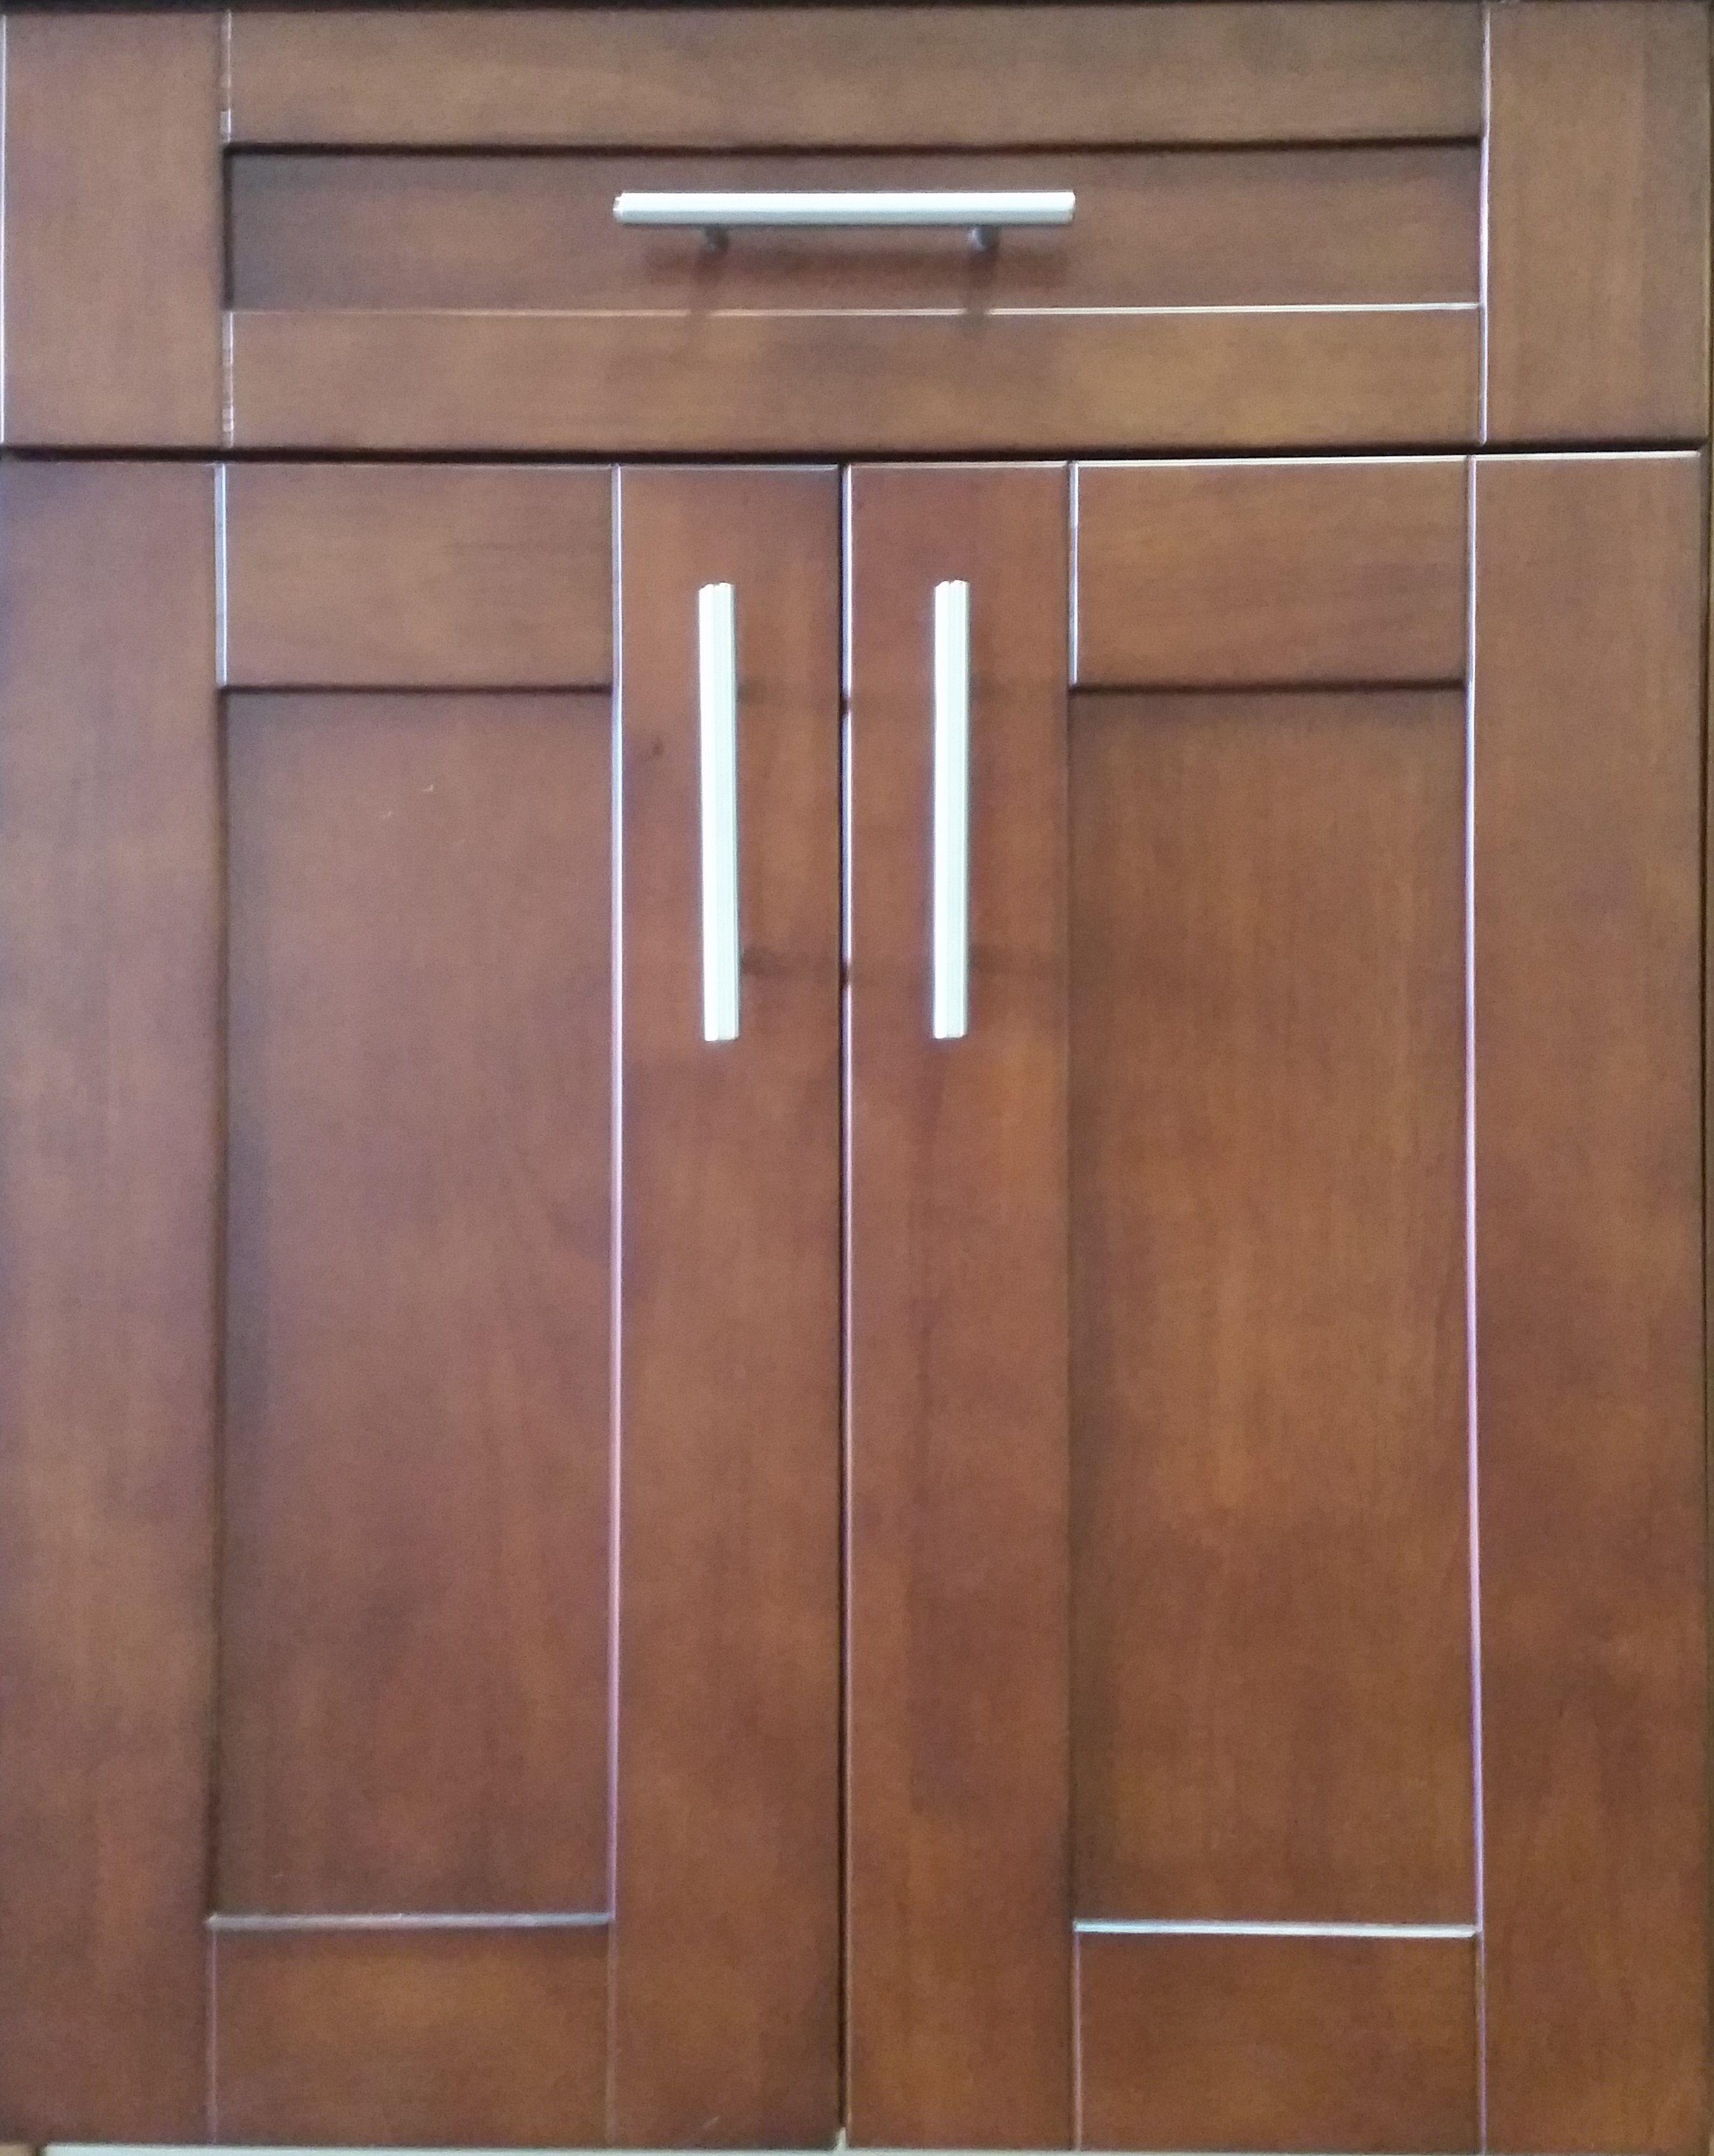 Cy Mahogany Shaker Cabinet Door Styles In 2019 Pinterest